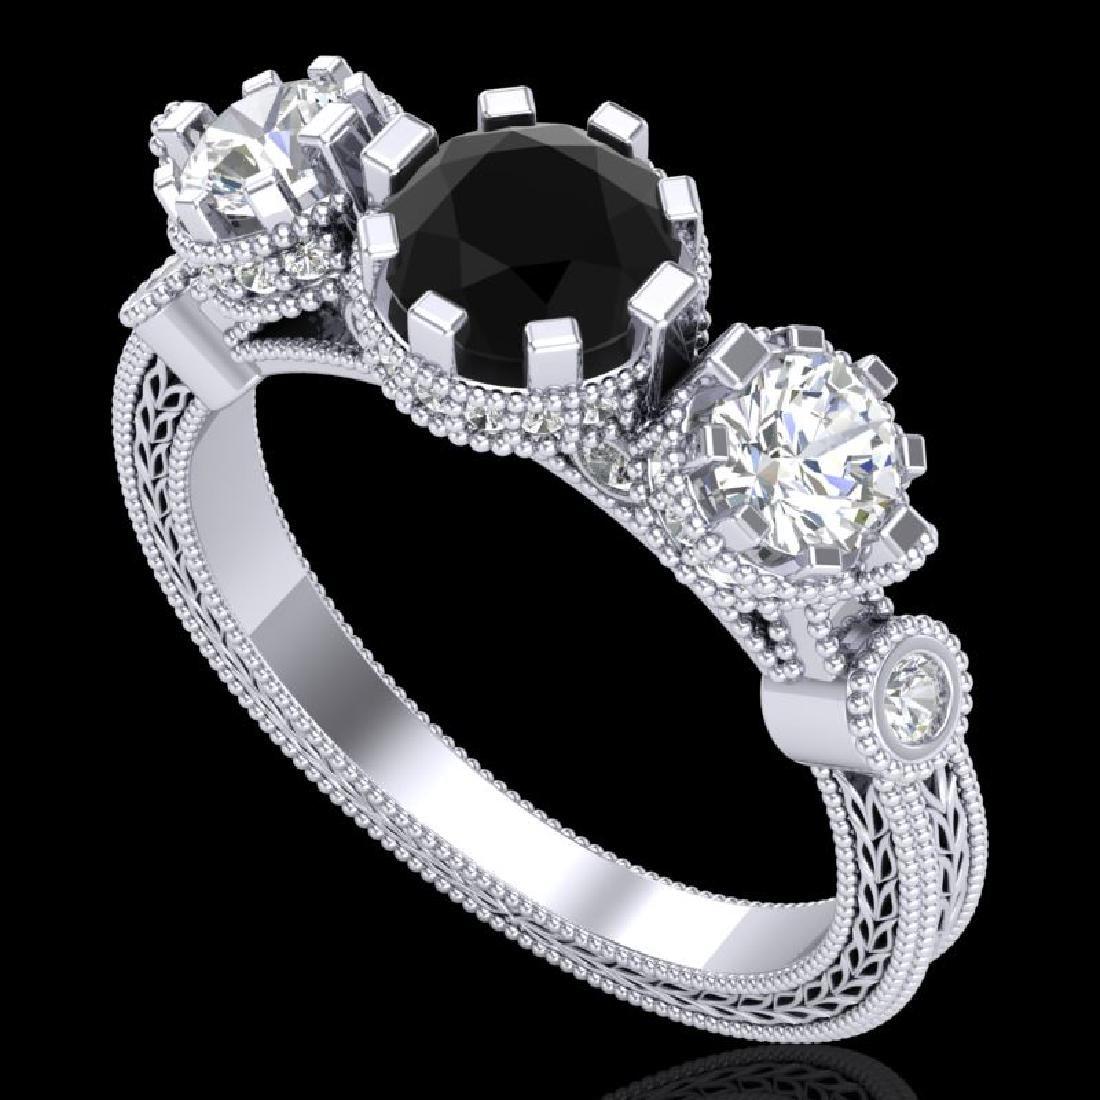 1.75 CTW Fancy Black Diamond Solitaire Art Deco 3 Stone